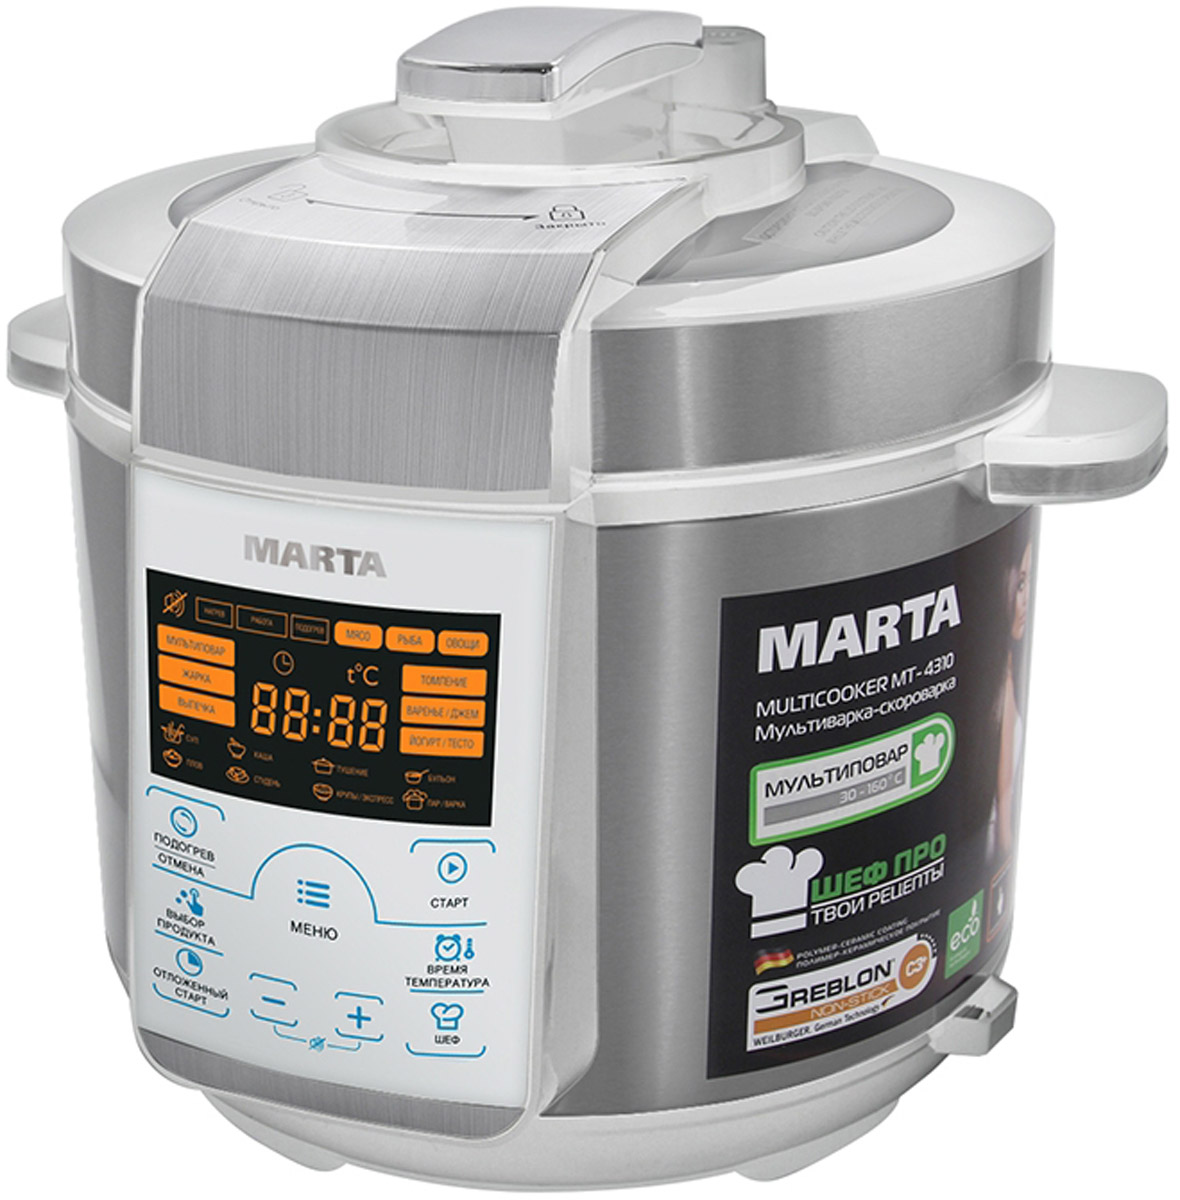 Marta MT-4310, White Steel мультиварка - Мультиварки